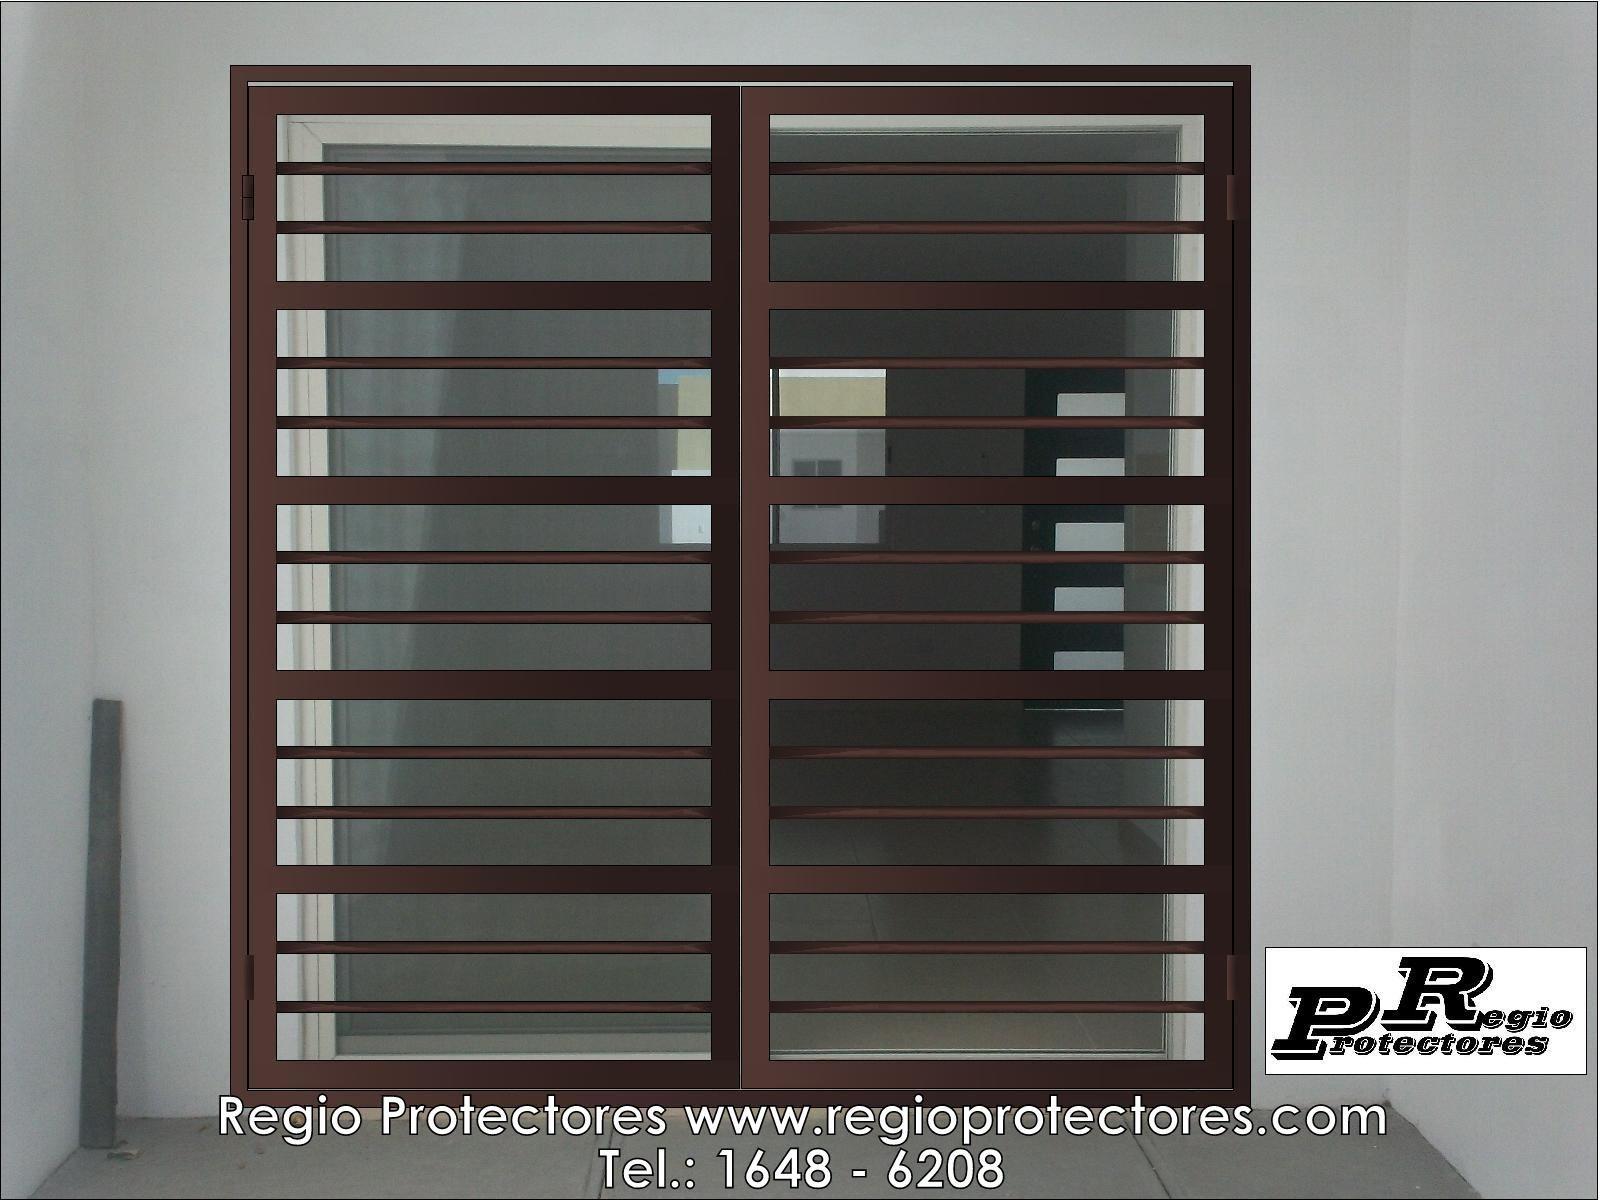 Herreria rodriguez fabricante de puertas y ventanas tattoo for Puertas de herreria forjada